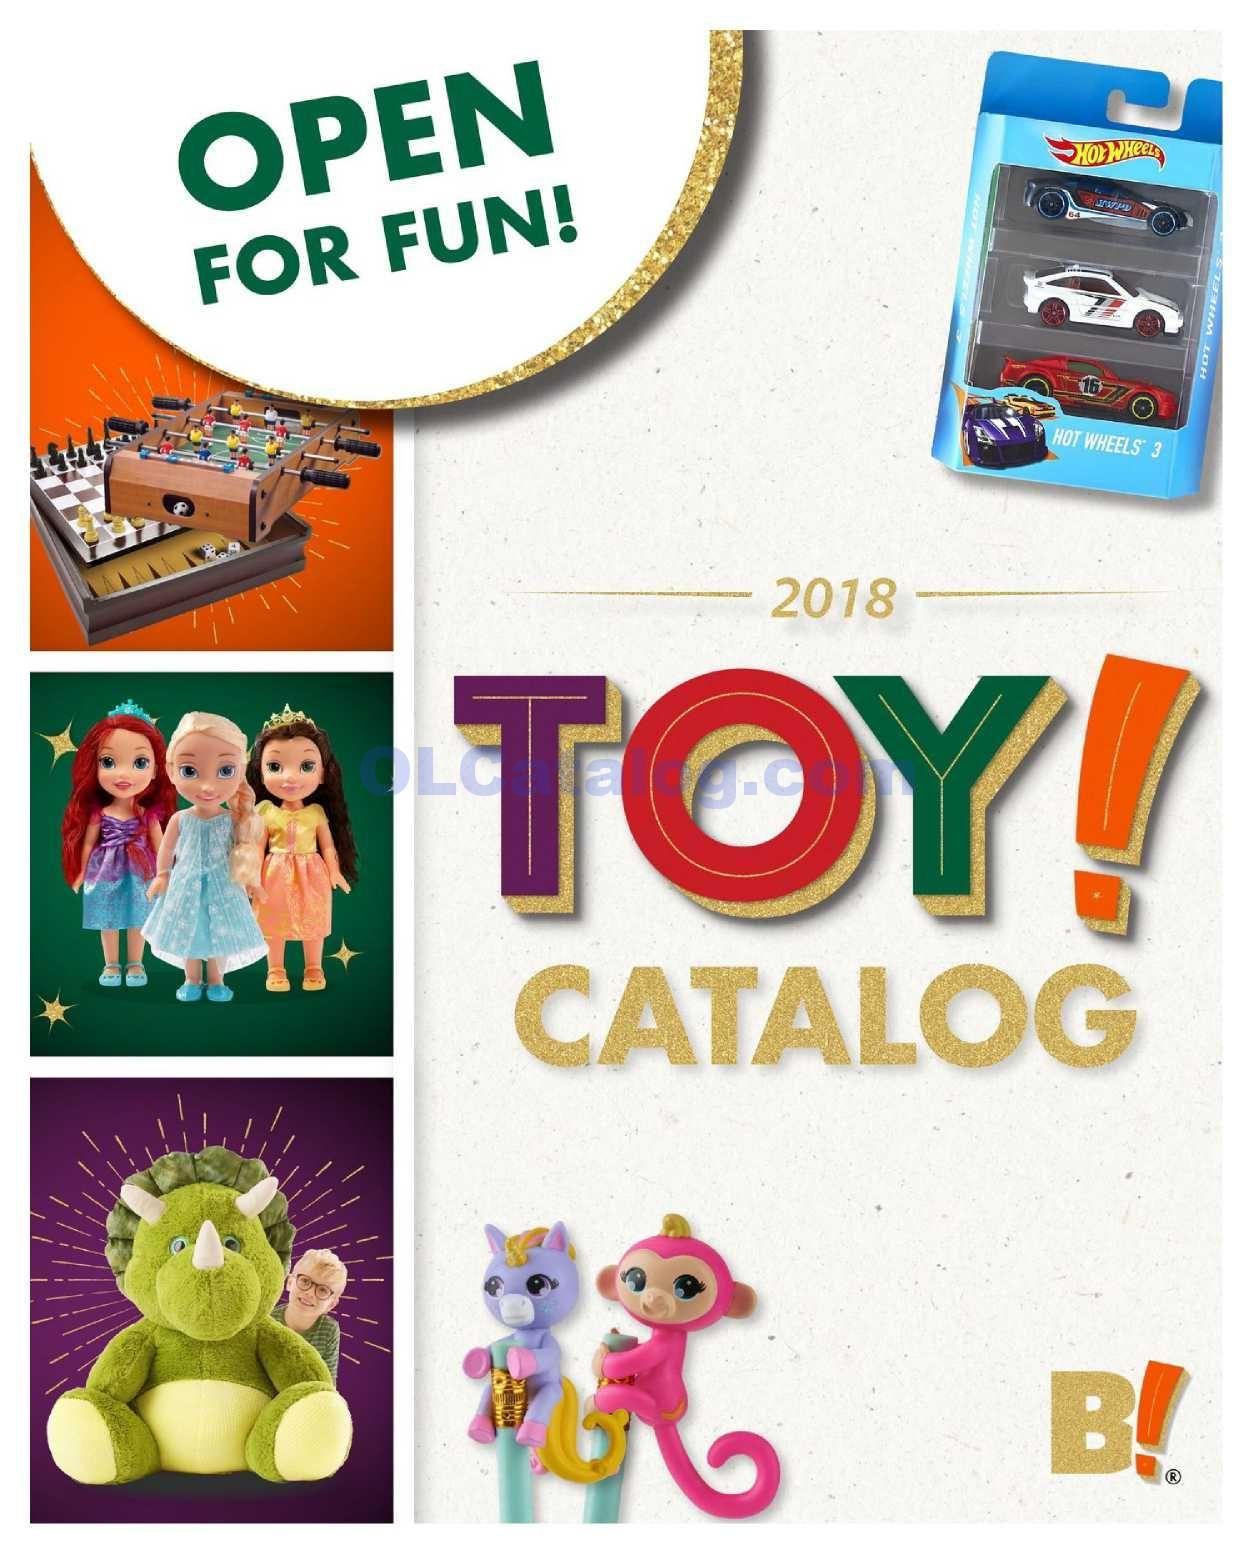 Big Lots Toy Catalog November 2 December 31, 2018. Do